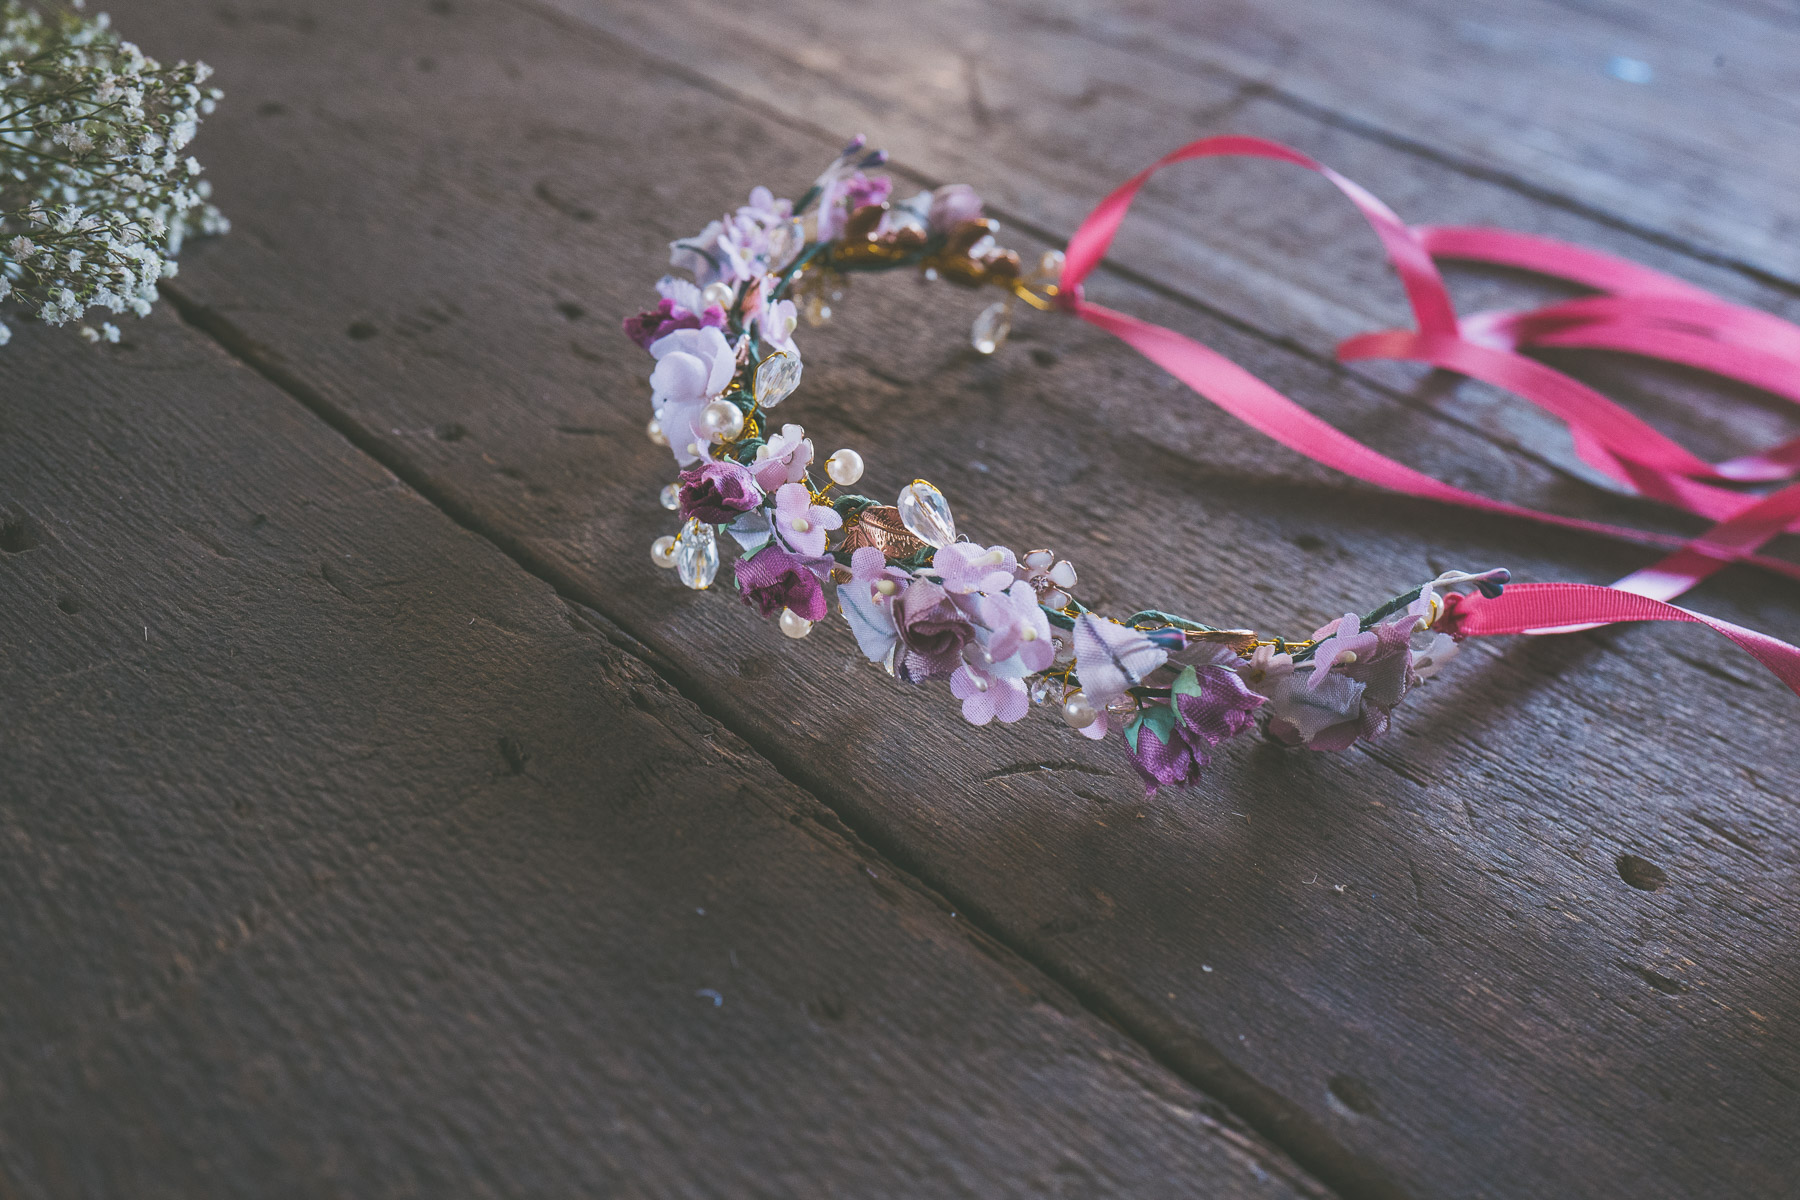 We-Are-Flowergirls_SS17_Couture-Collection_Blumenkranz_Flowercrown_038_1160690.jpg